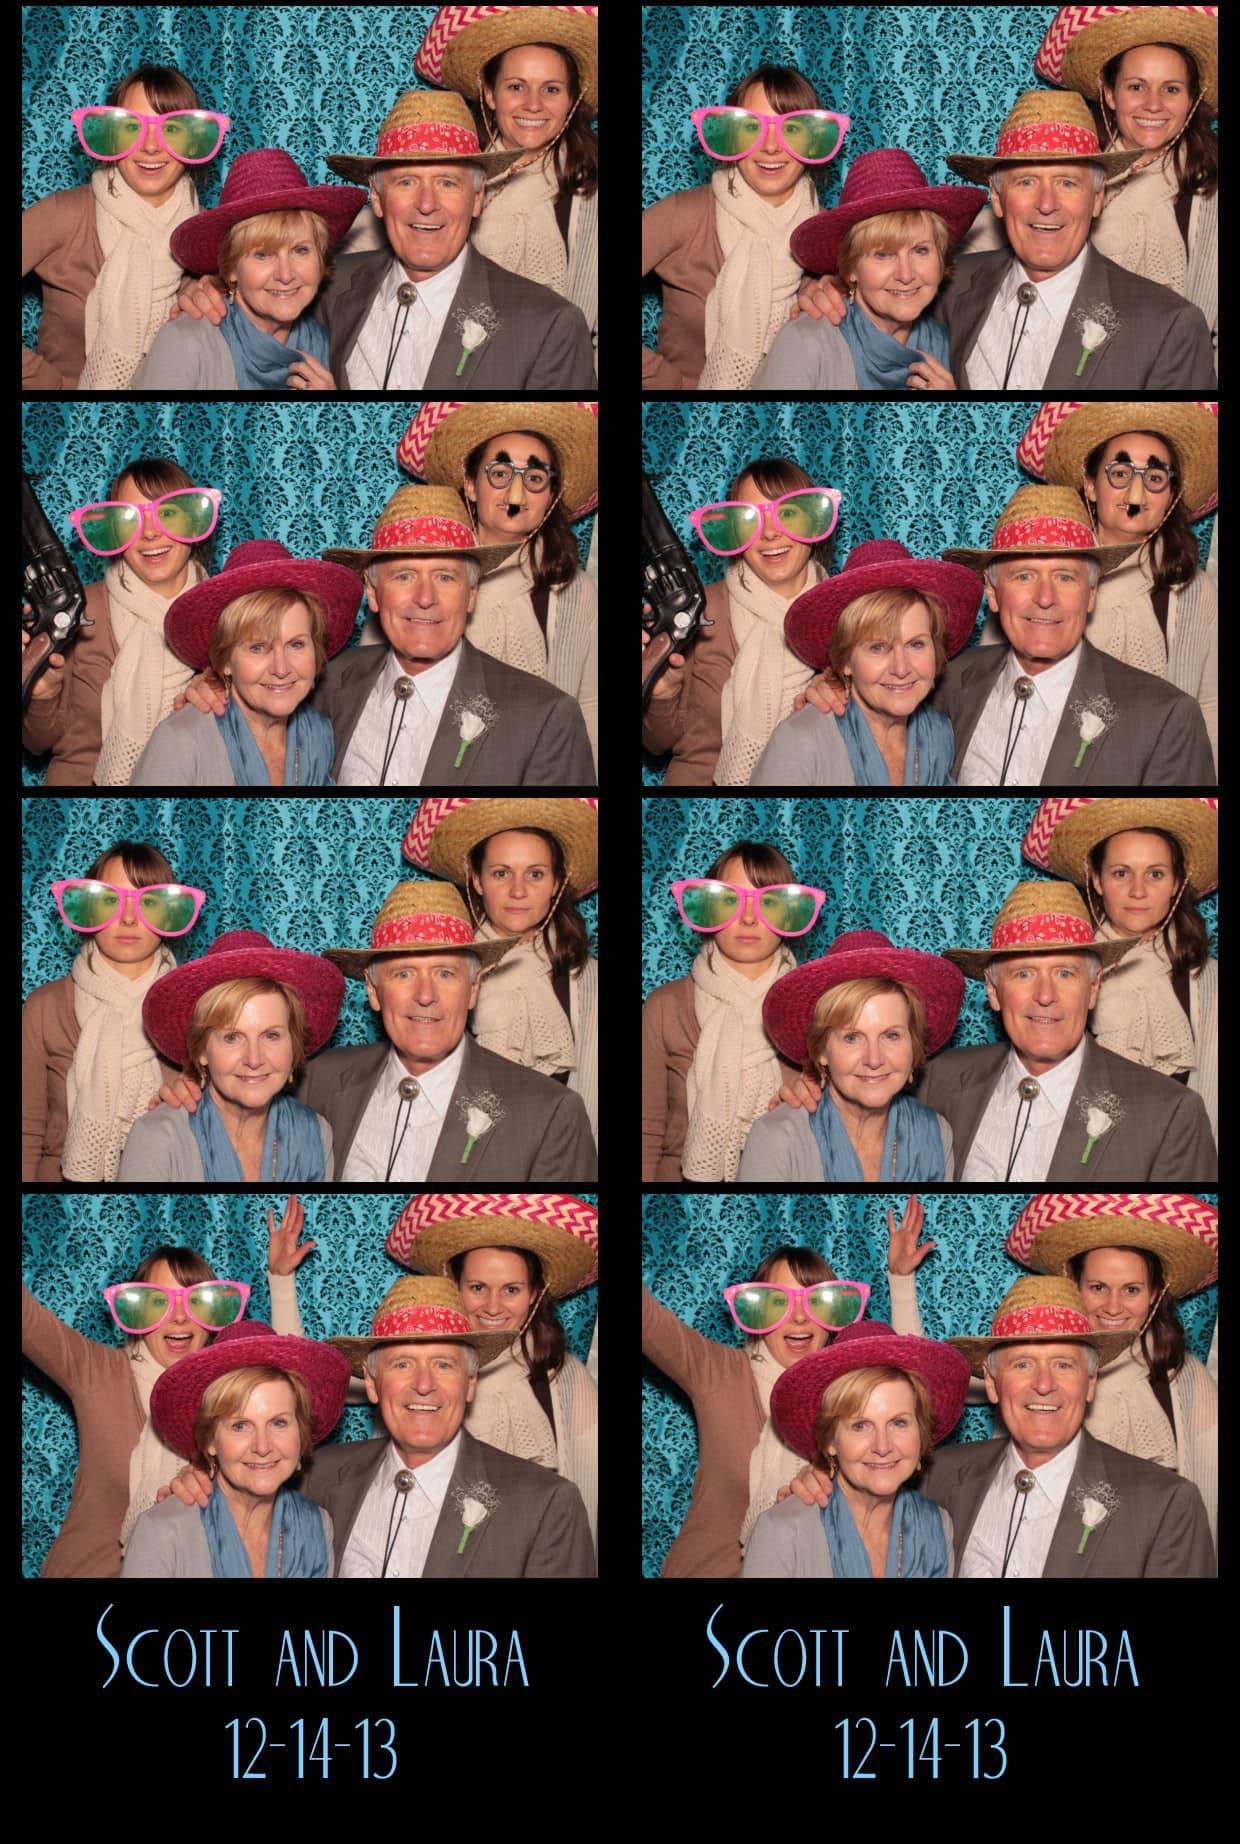 Photobooth-Austin-Rental-Party-Wedding-Reception-No. 1-Memories-Fun-Props